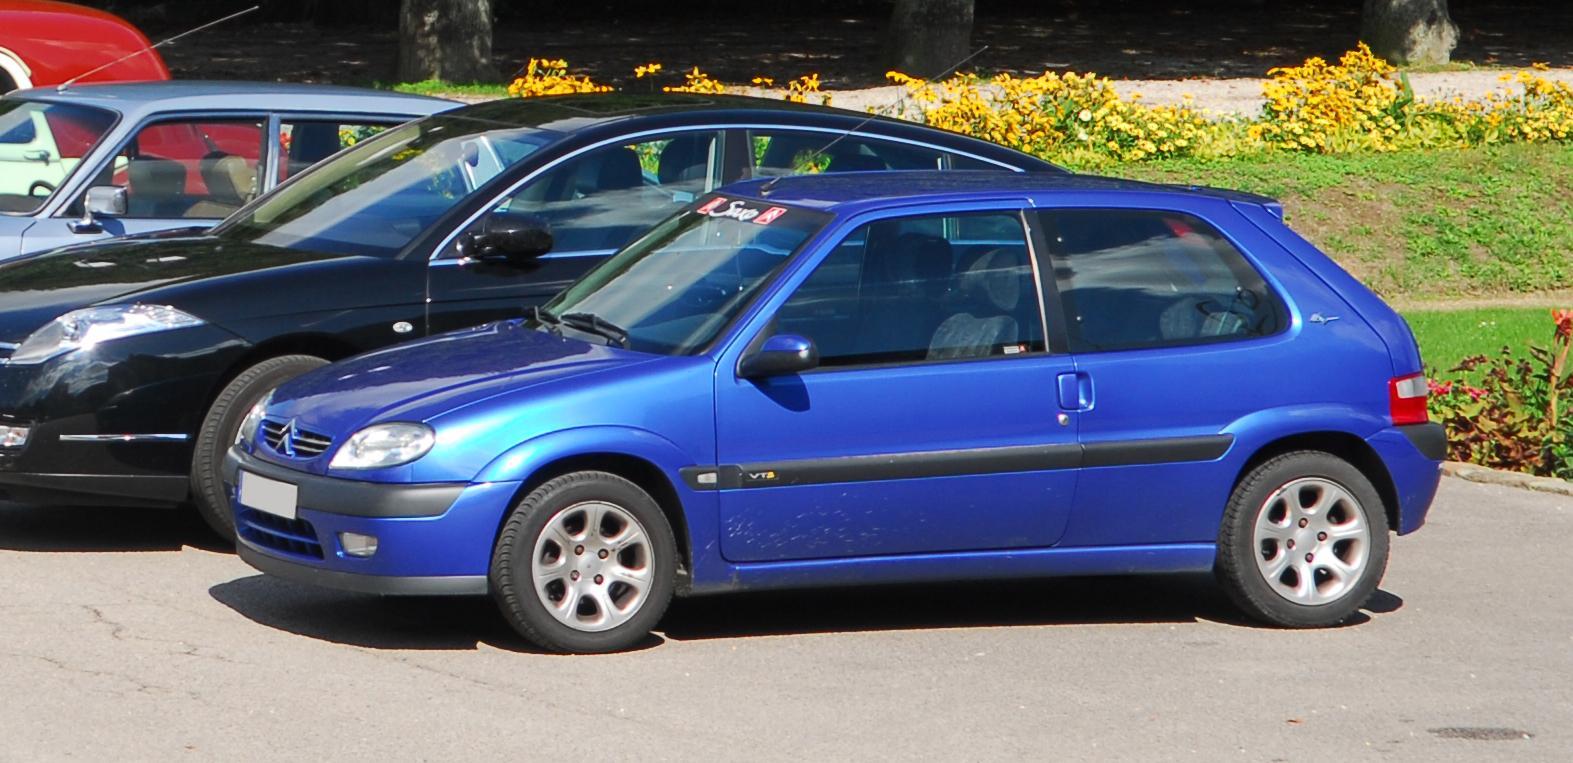 1998 Citroën Saxo 1 6 16v VTS